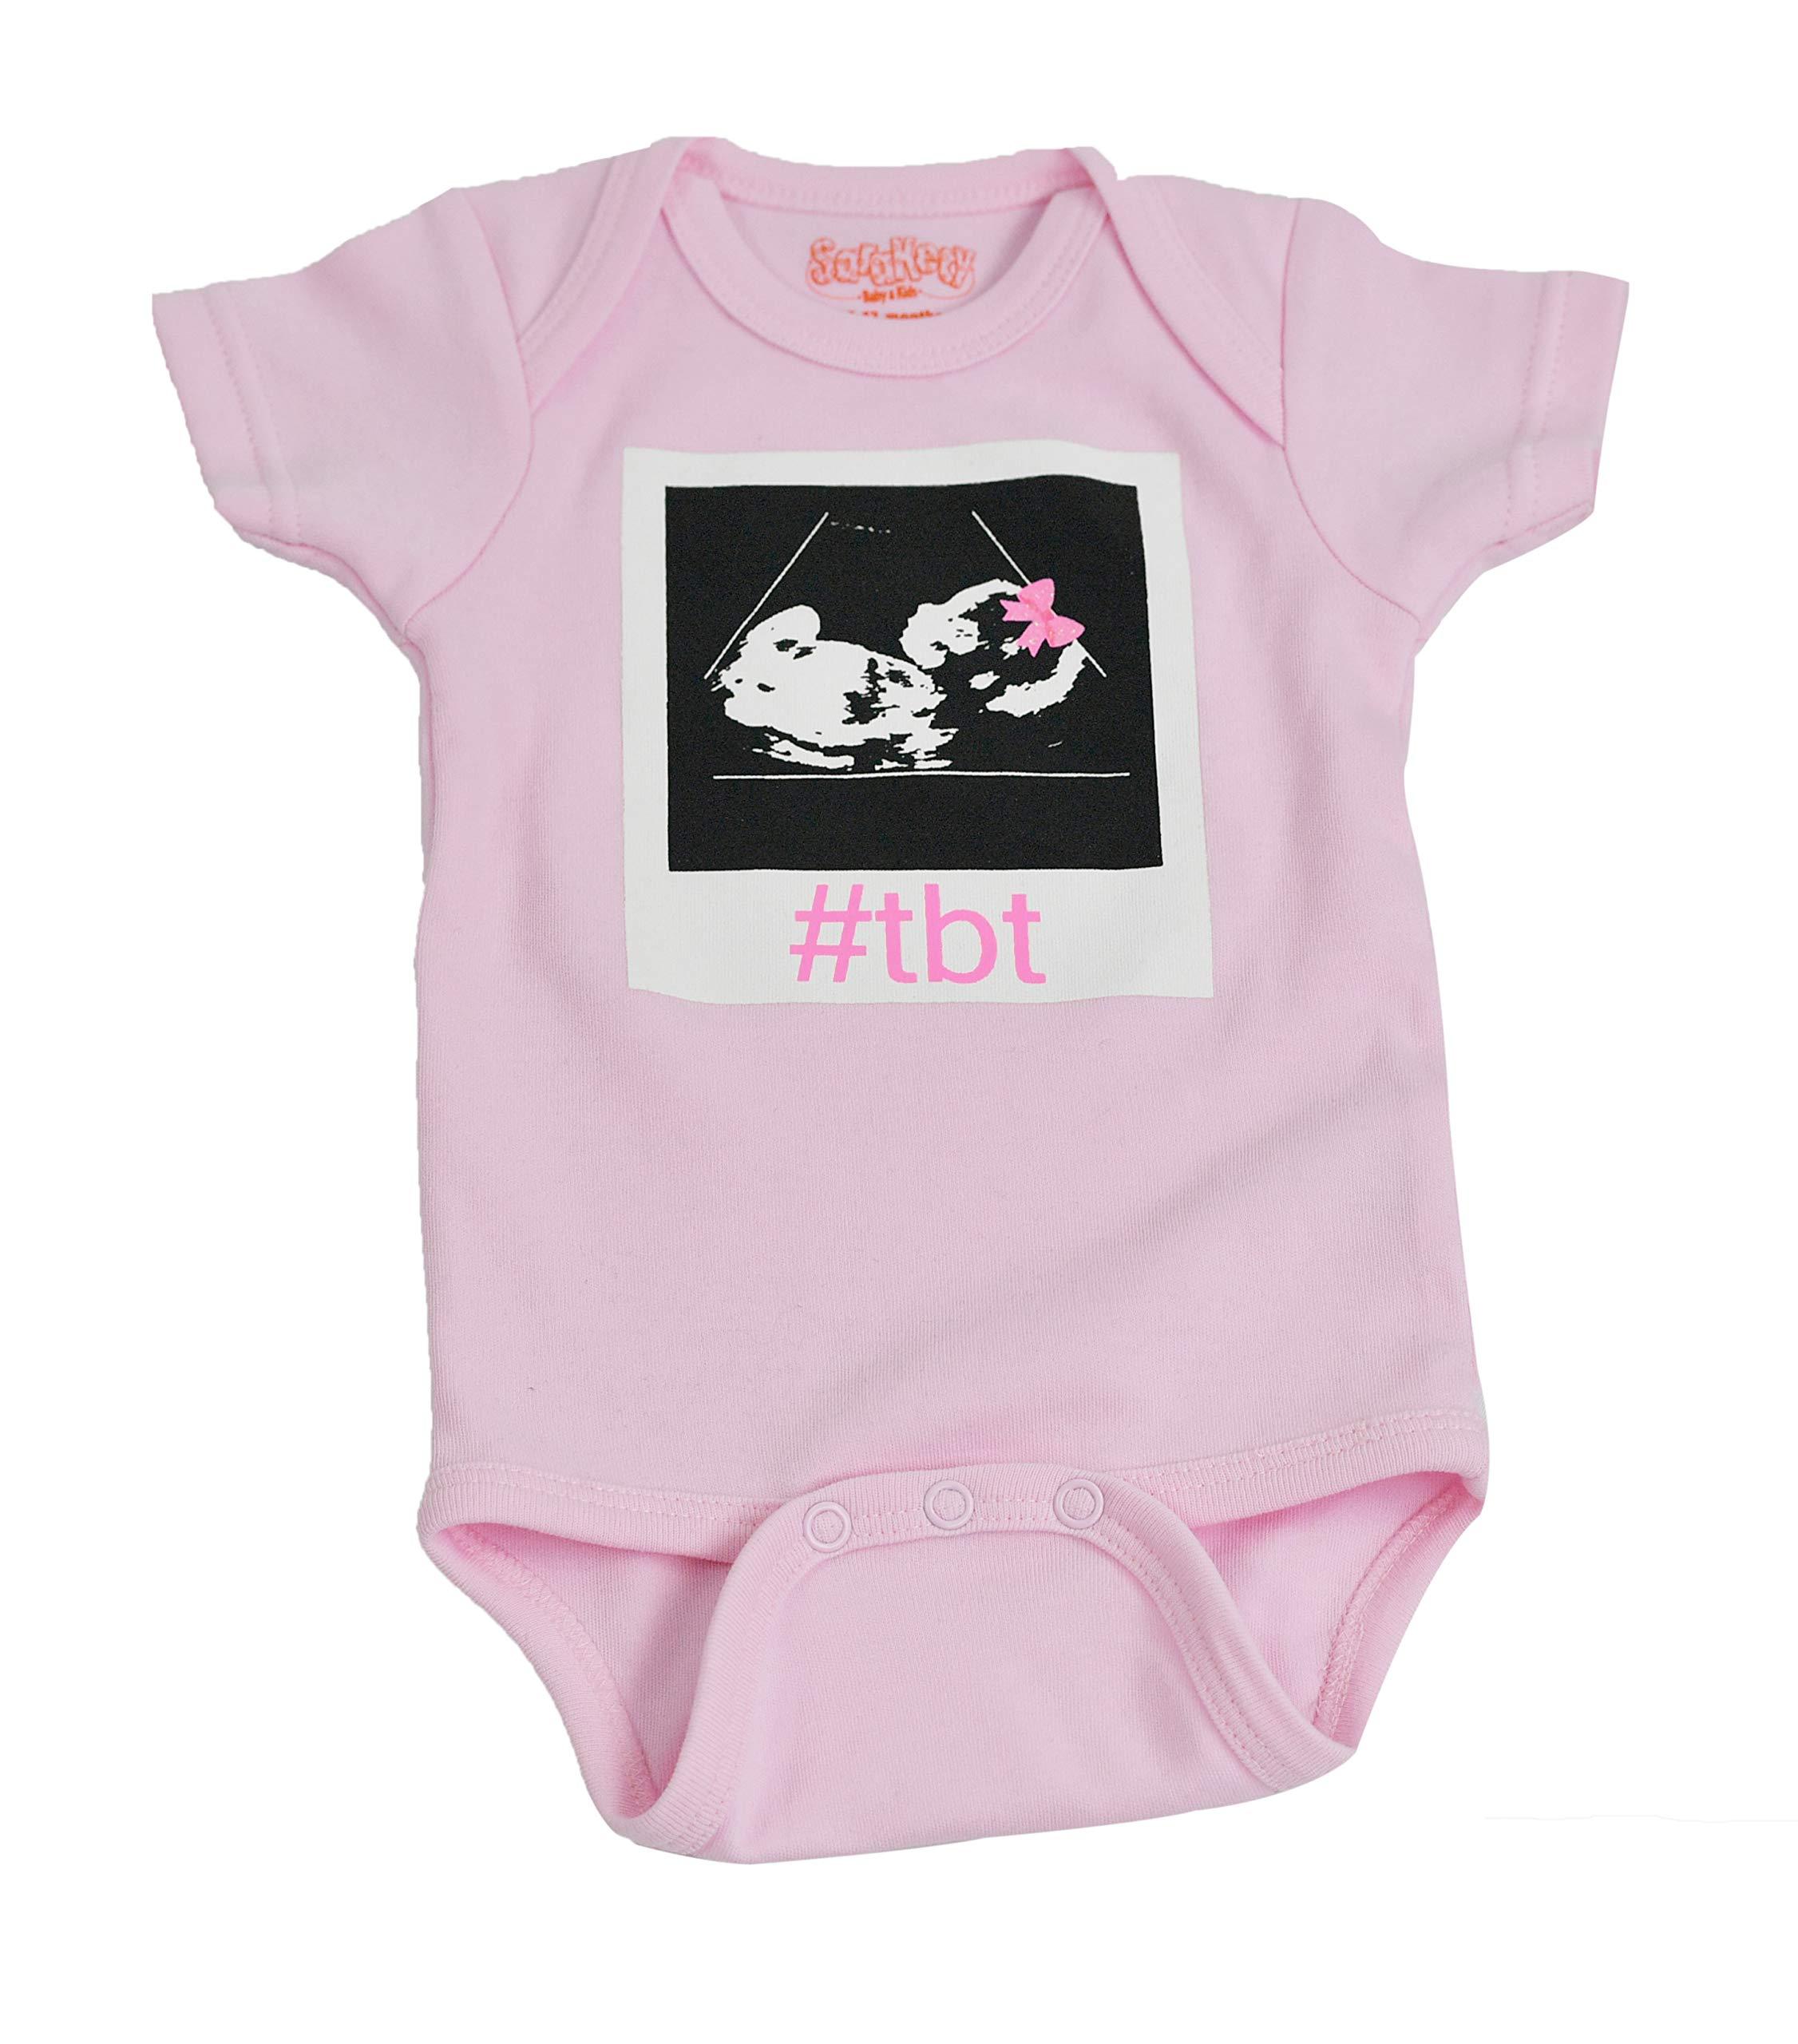 ecbcfe2d52 Amazon.com  Sara Kety TBT Onezee 0-6 Months Black  Baby